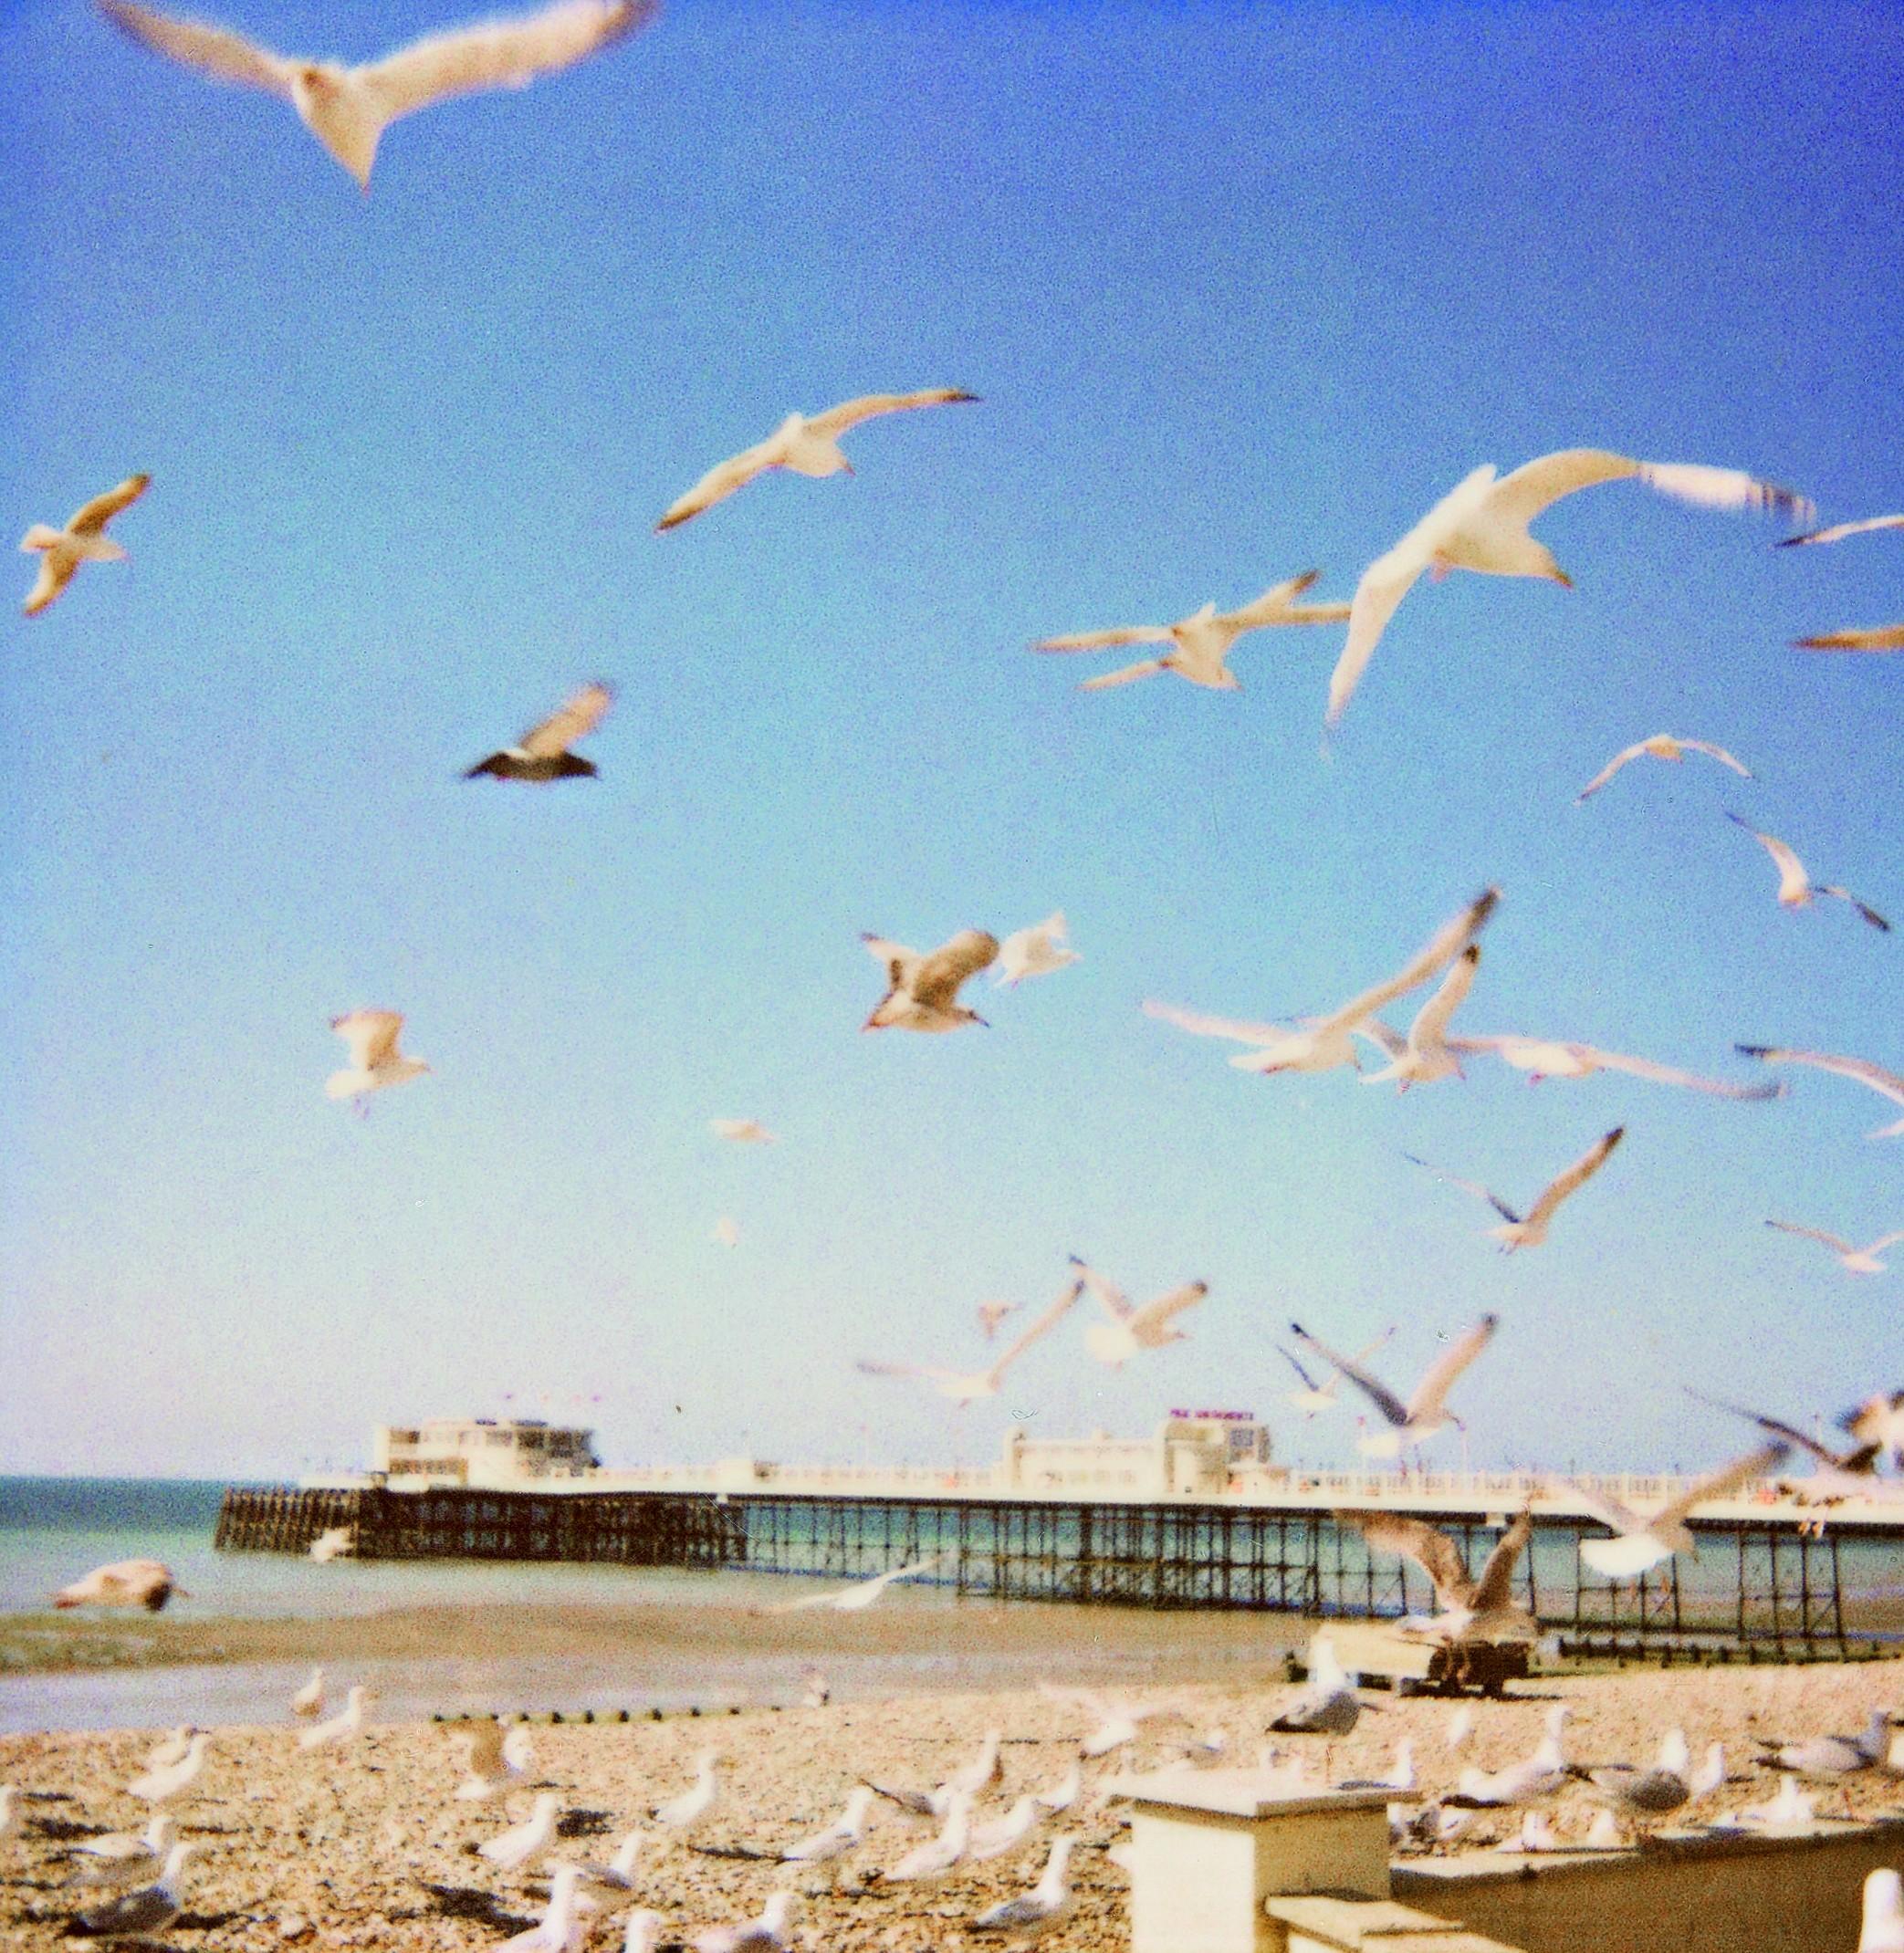 Forget Instagram, photographer uses 70s Polaroid camera for nostalgic seaside snaps